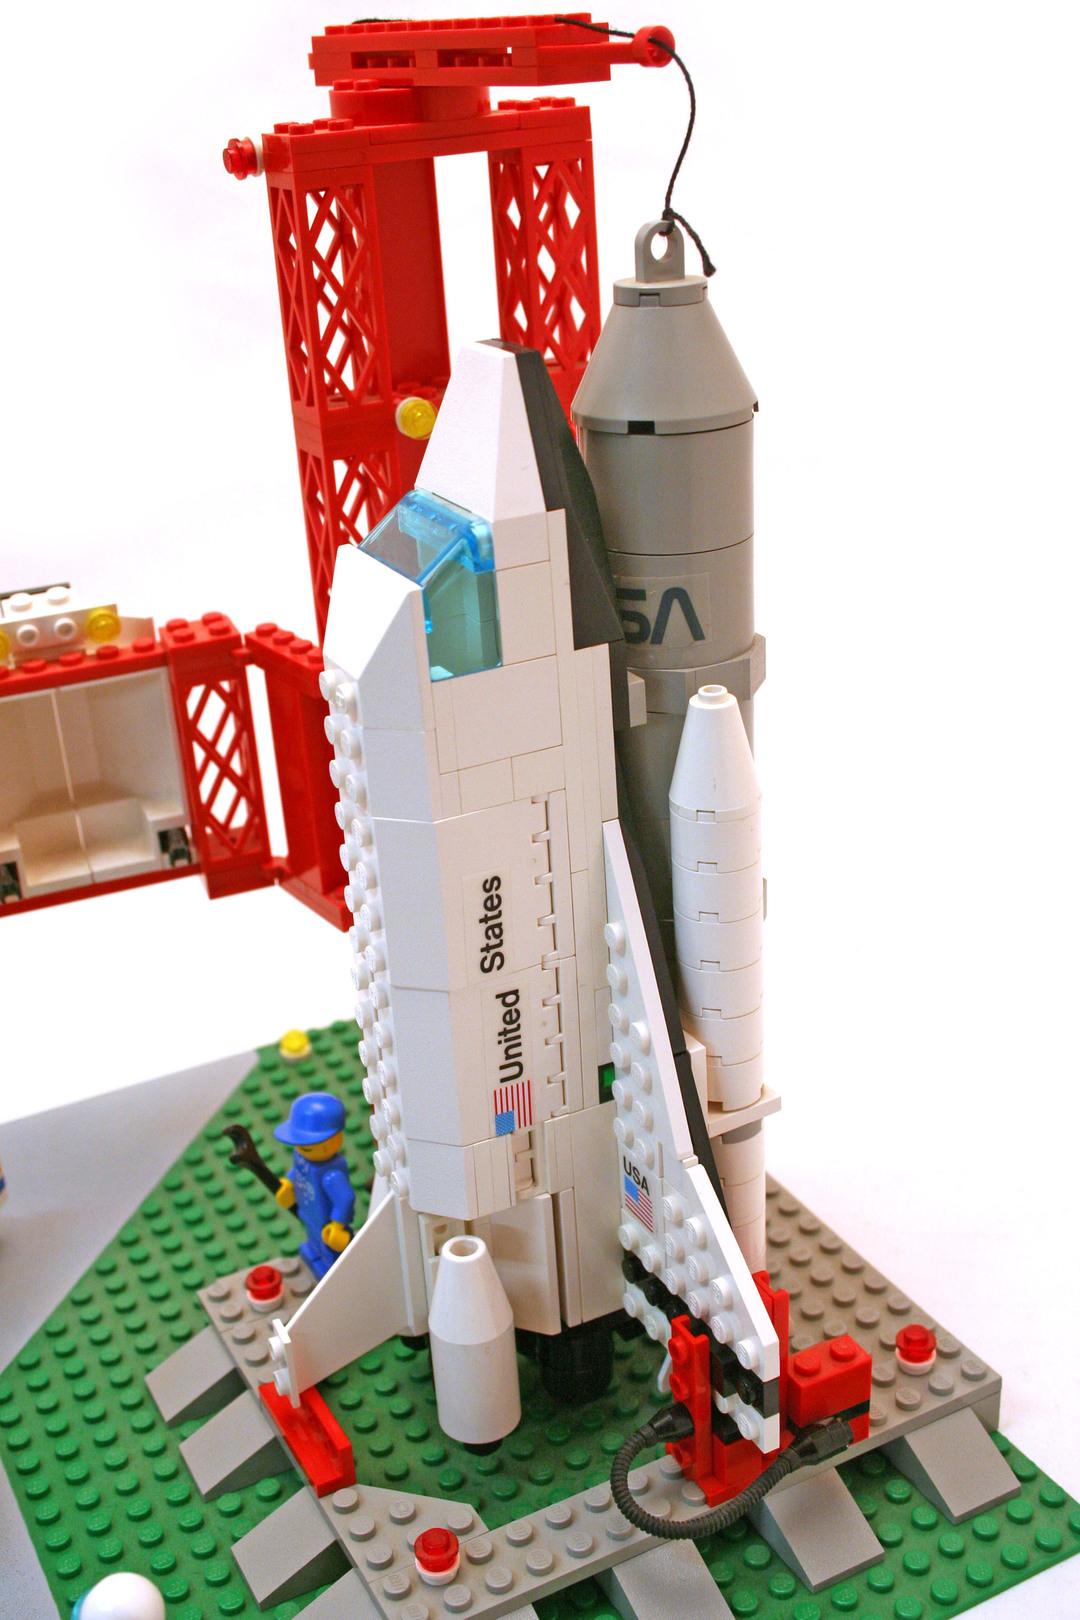 space shuttle set - photo #43